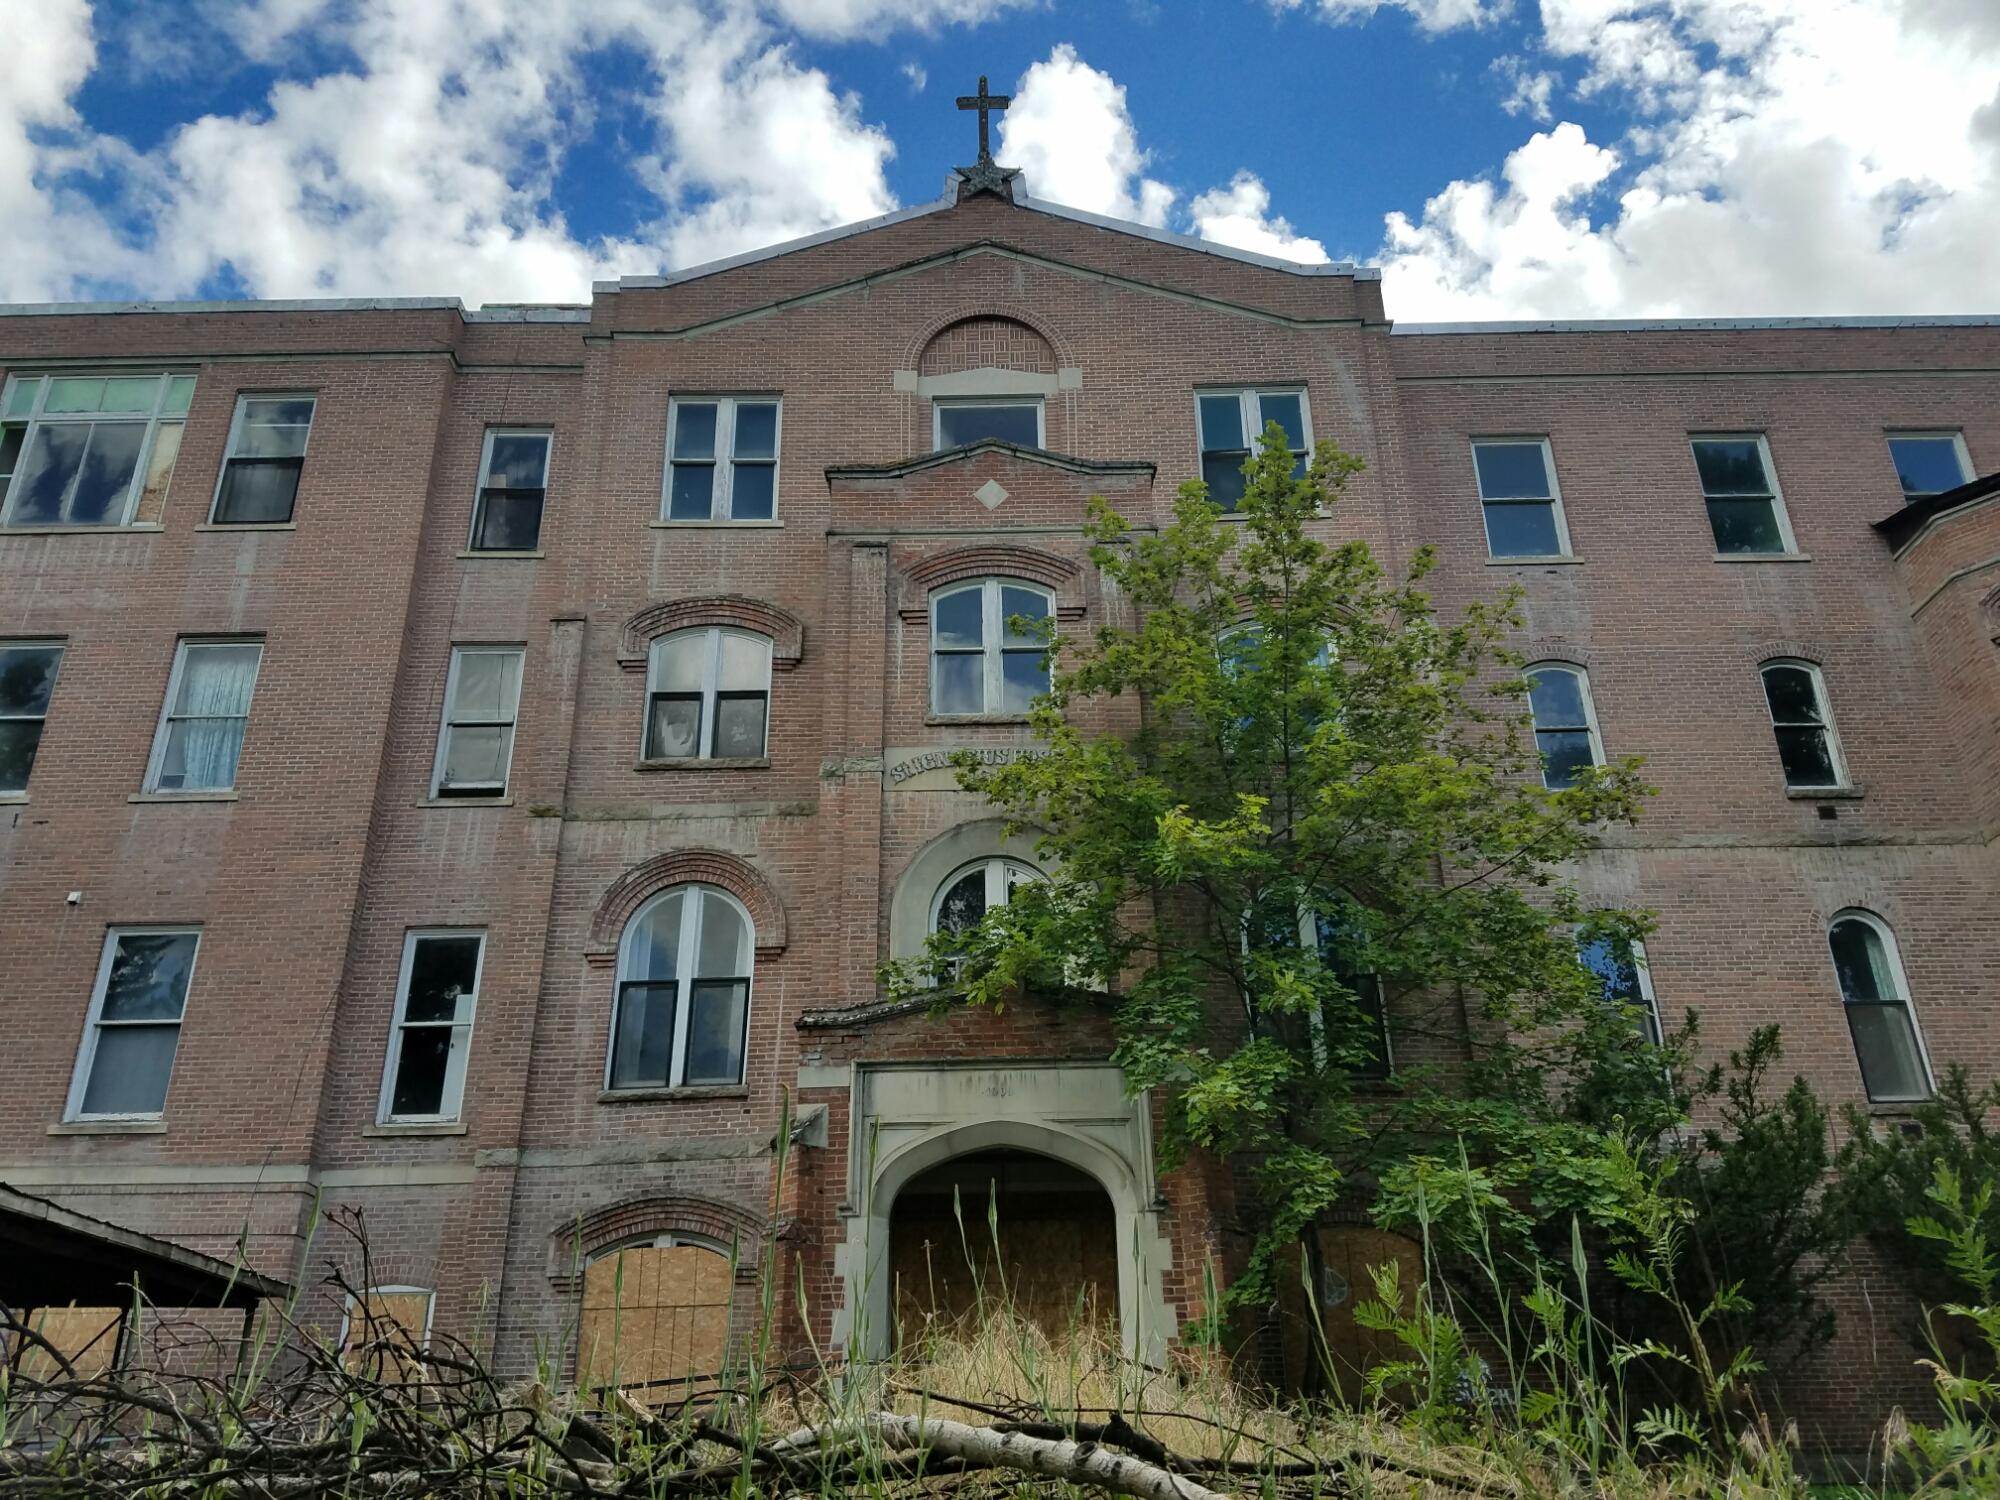 St. Ignatius Hospital